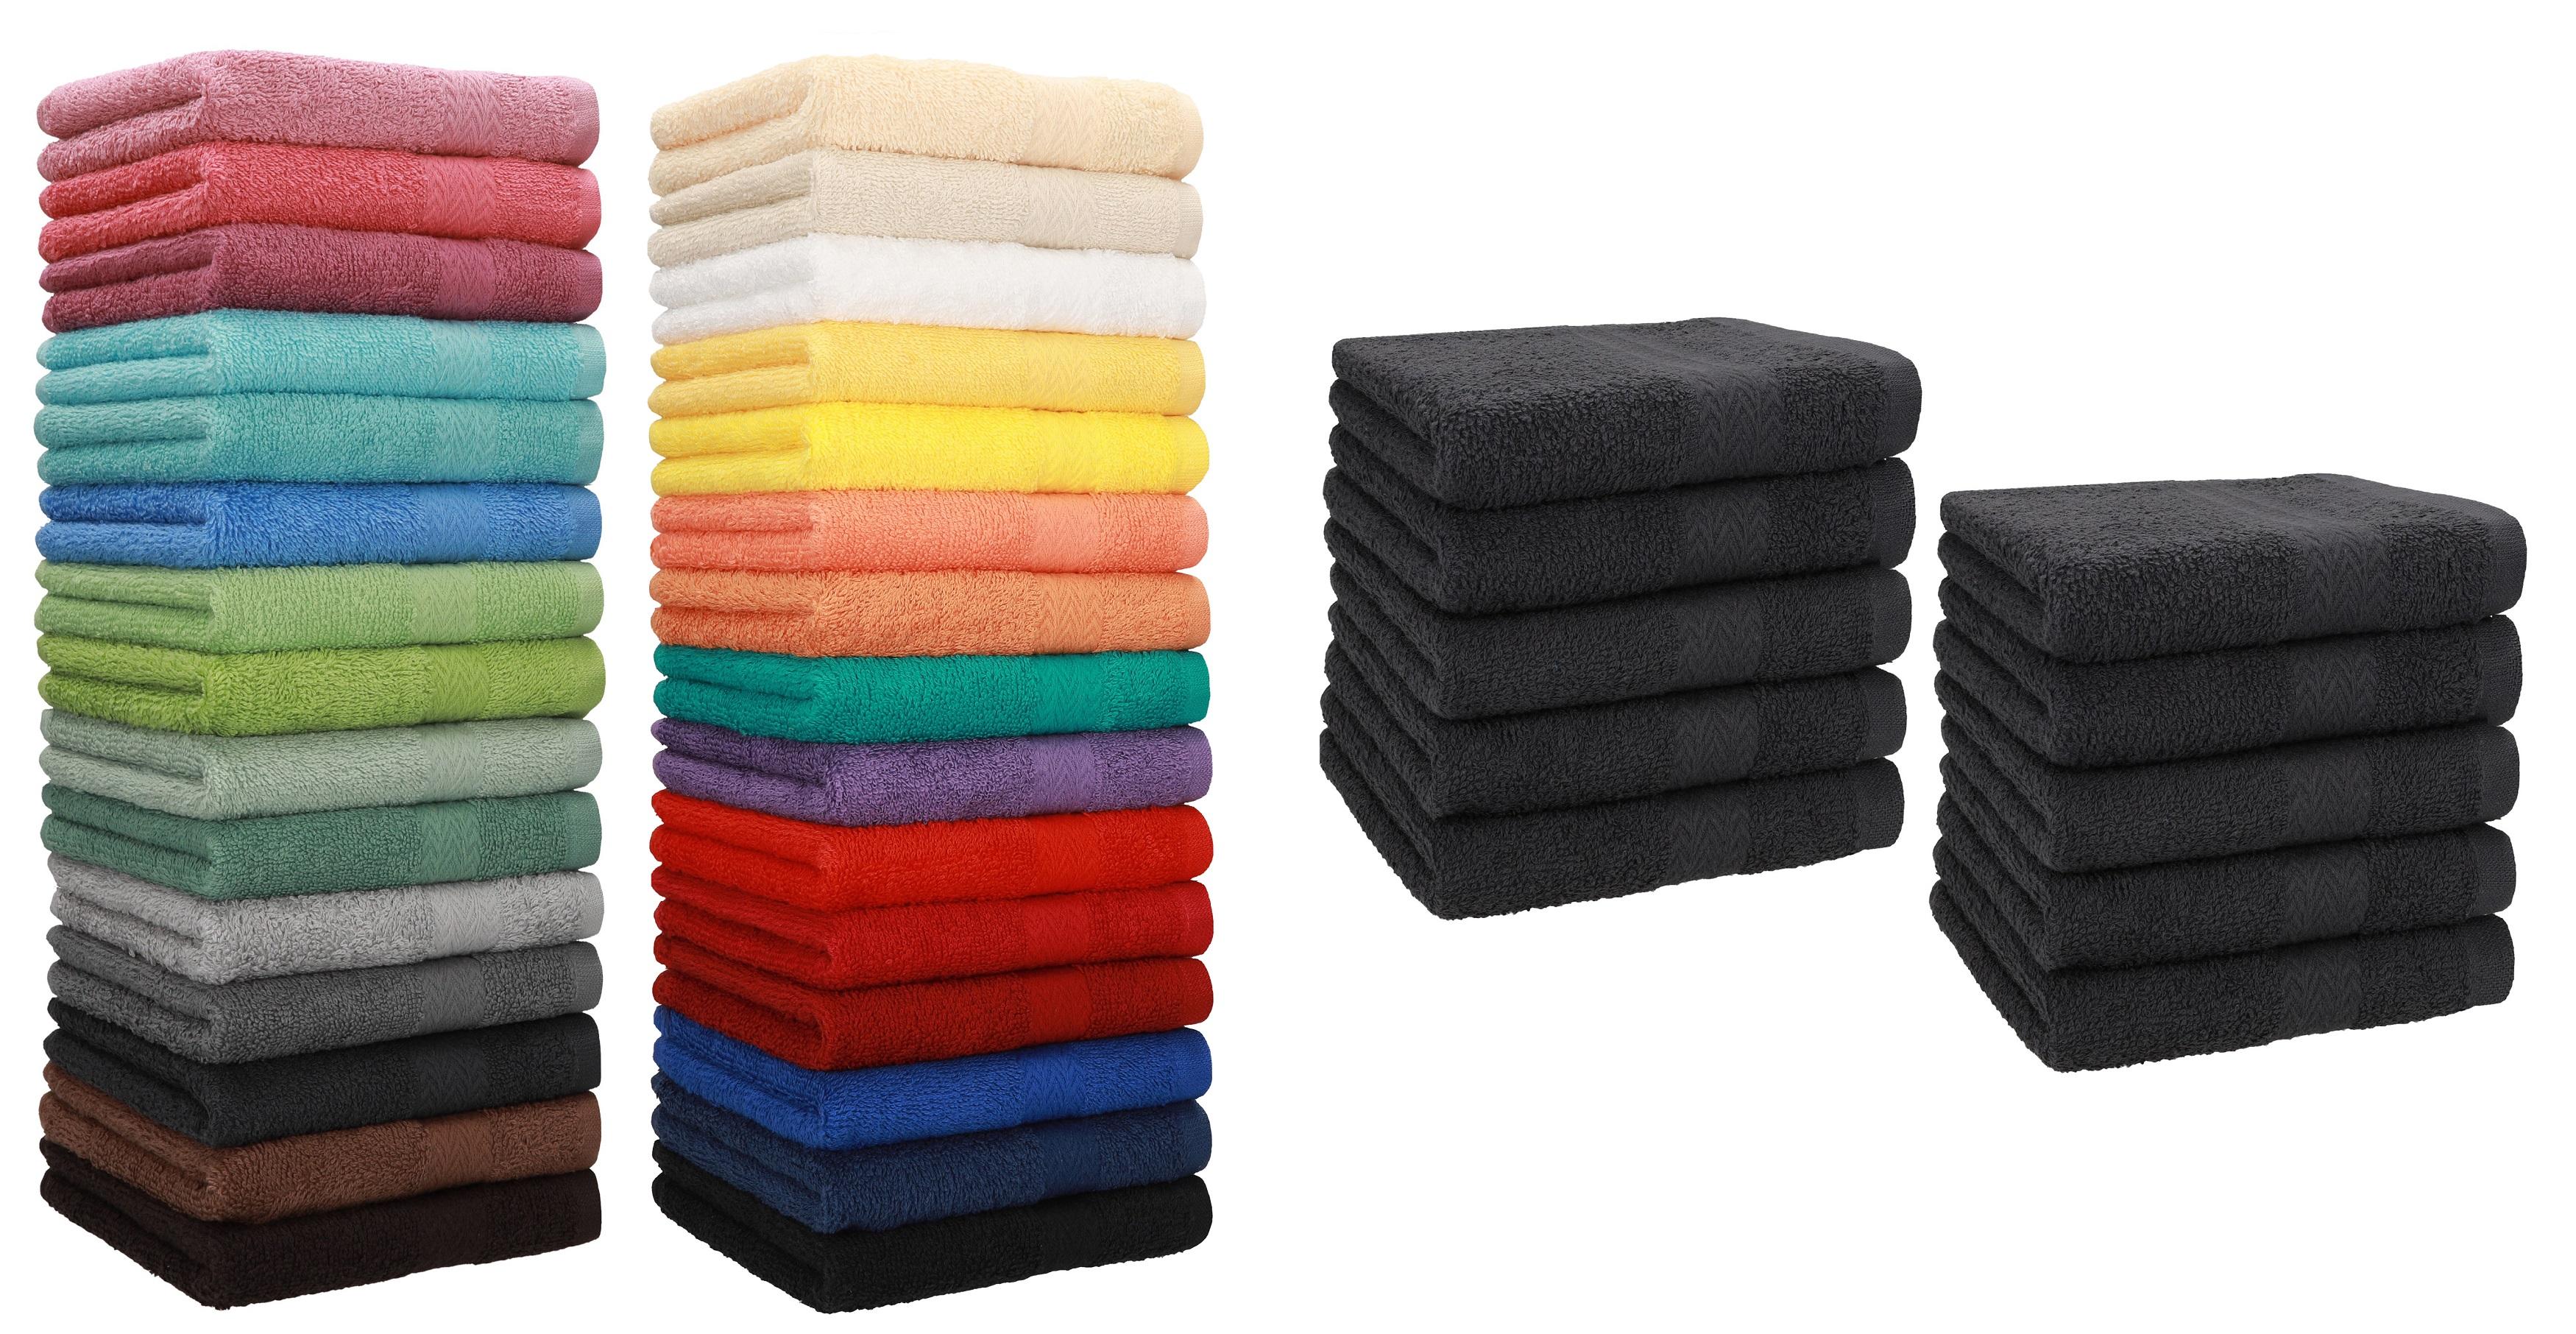 Betz 10 Stück Seiftücher Seiflappen Seiftuch PREMIUM 30x30cm schwarz /& weiß